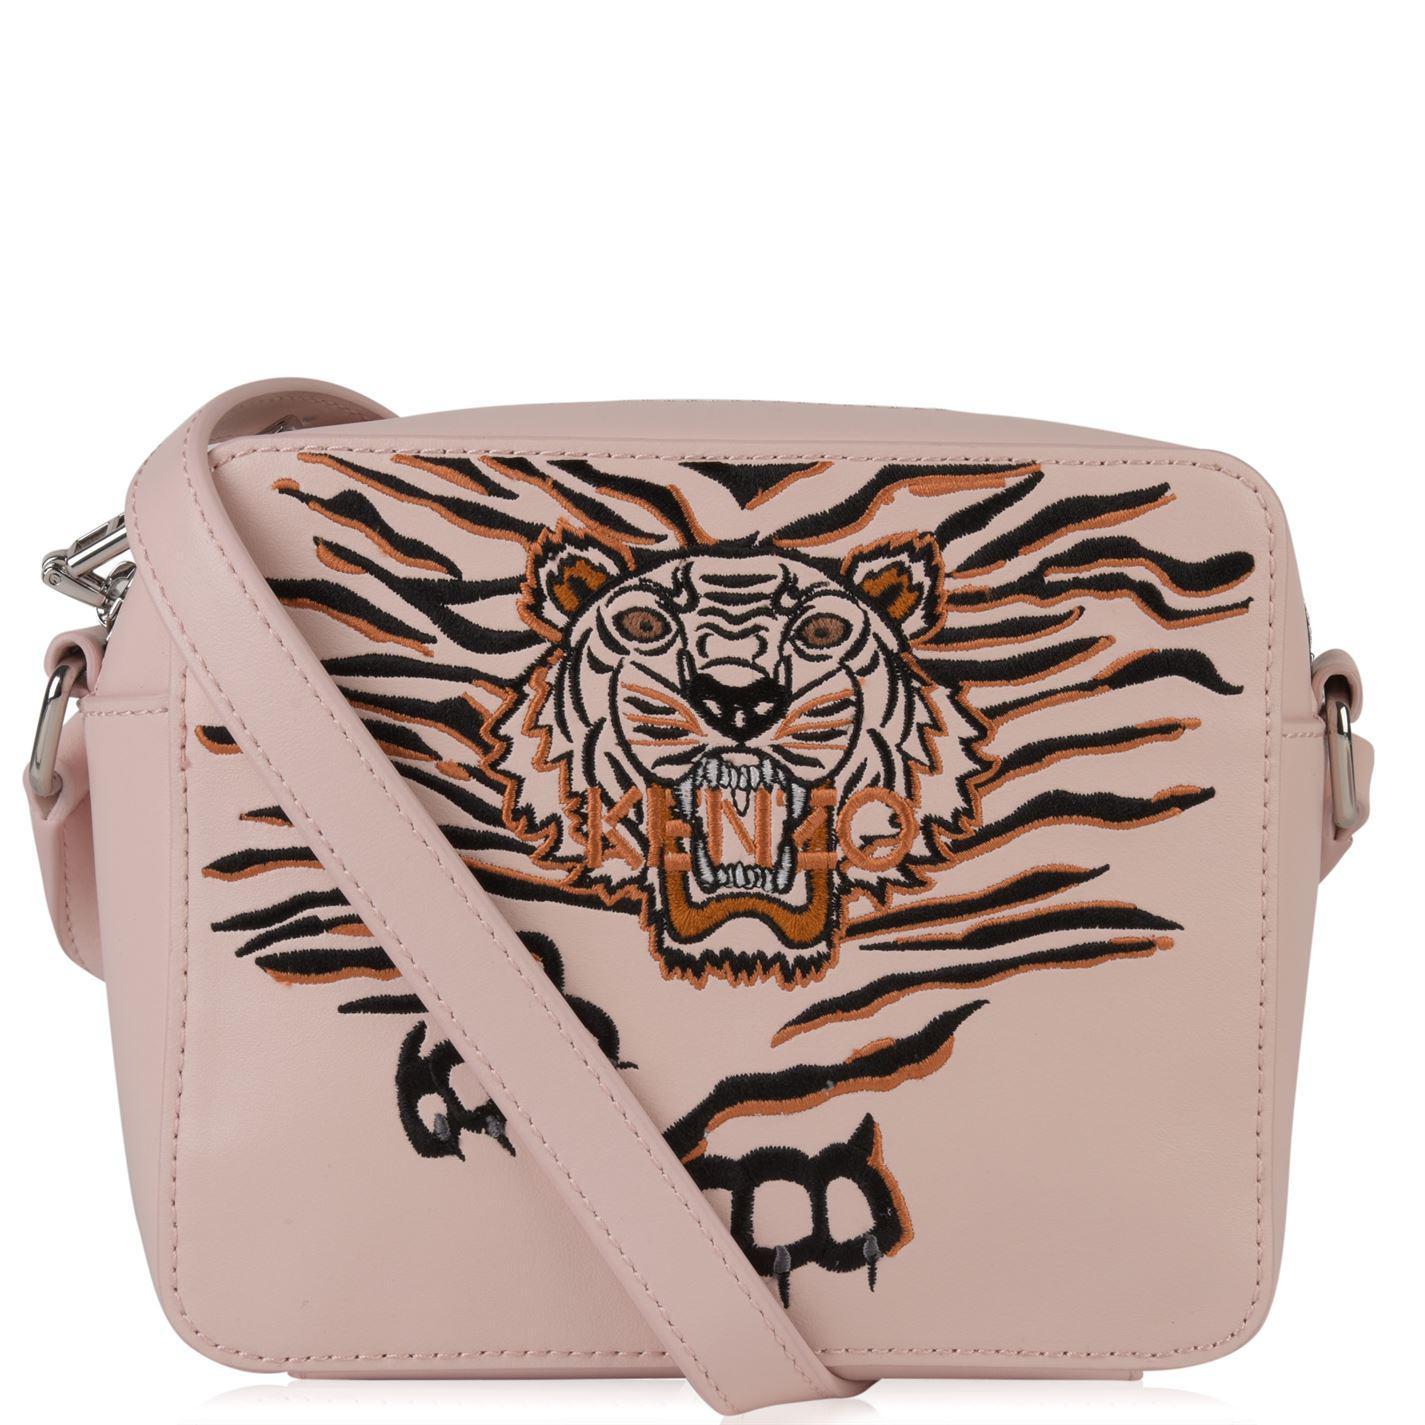 35962e5ac7 KENZO Crawling Tiger Camera Bag in Pink - Lyst